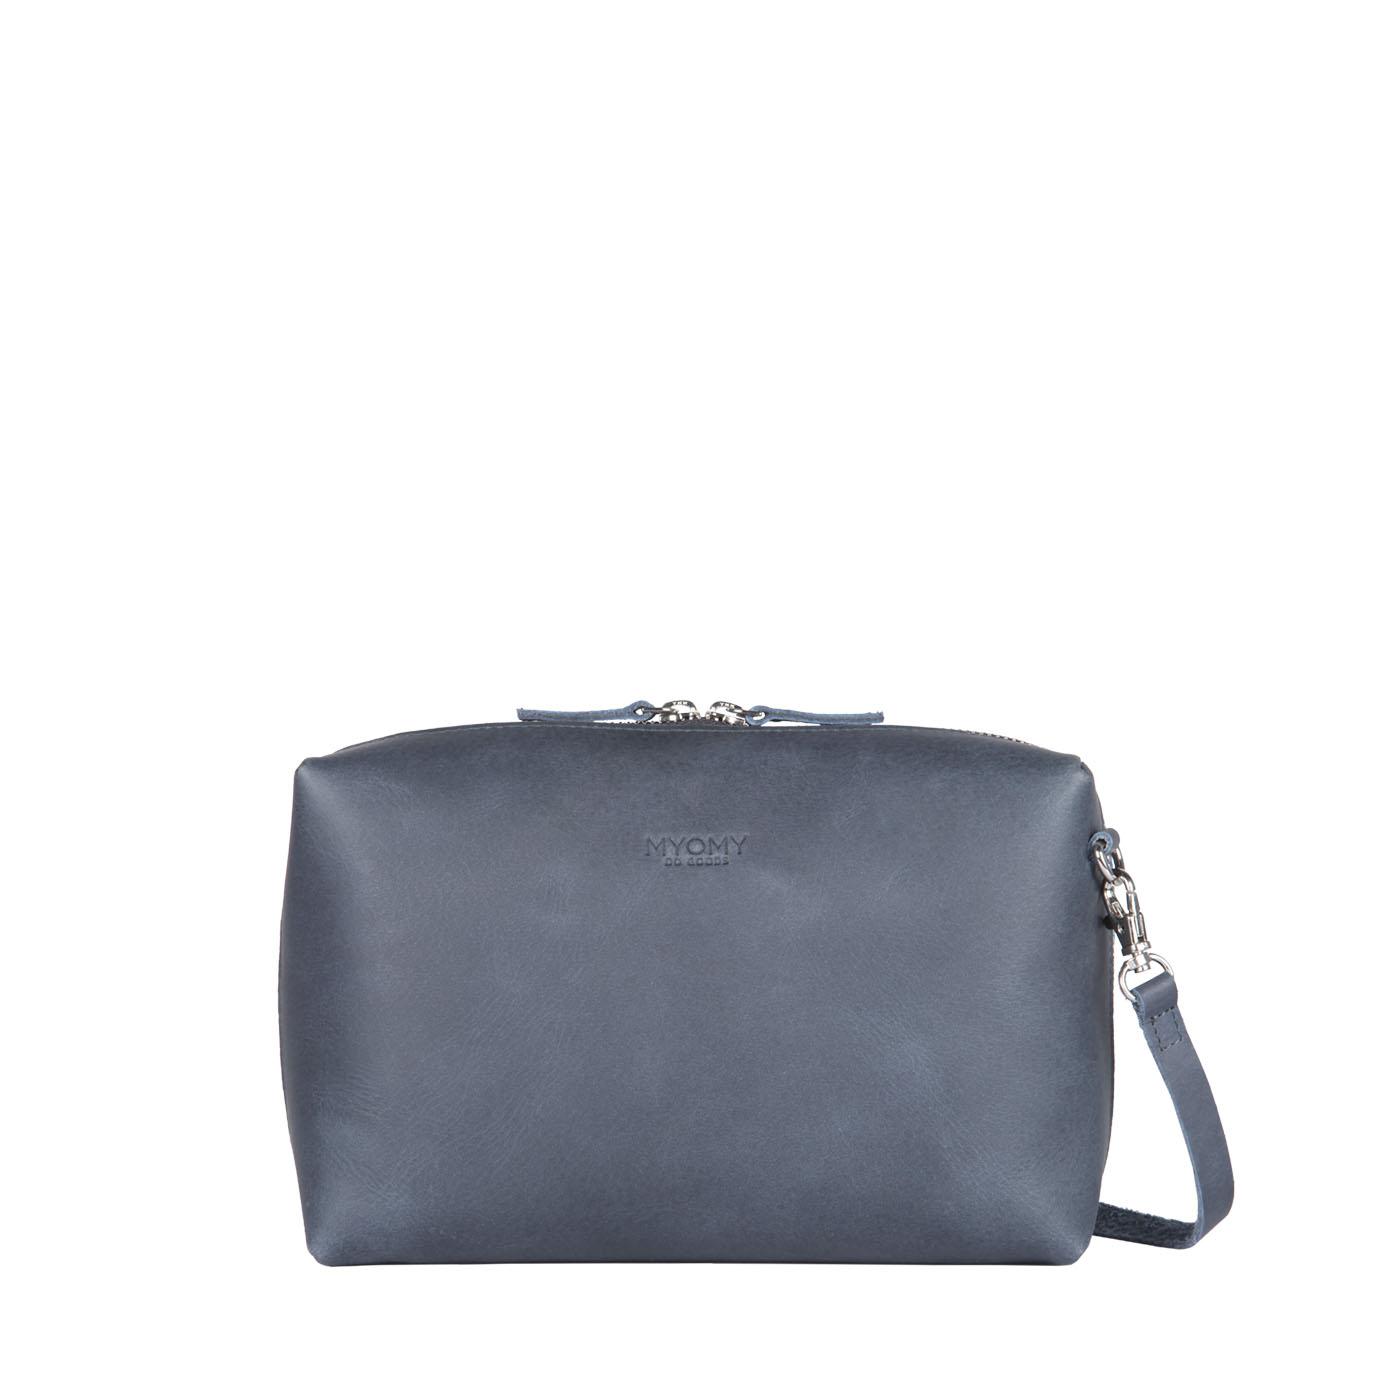 MY BOXY BAG Handbag - hunter navy blue